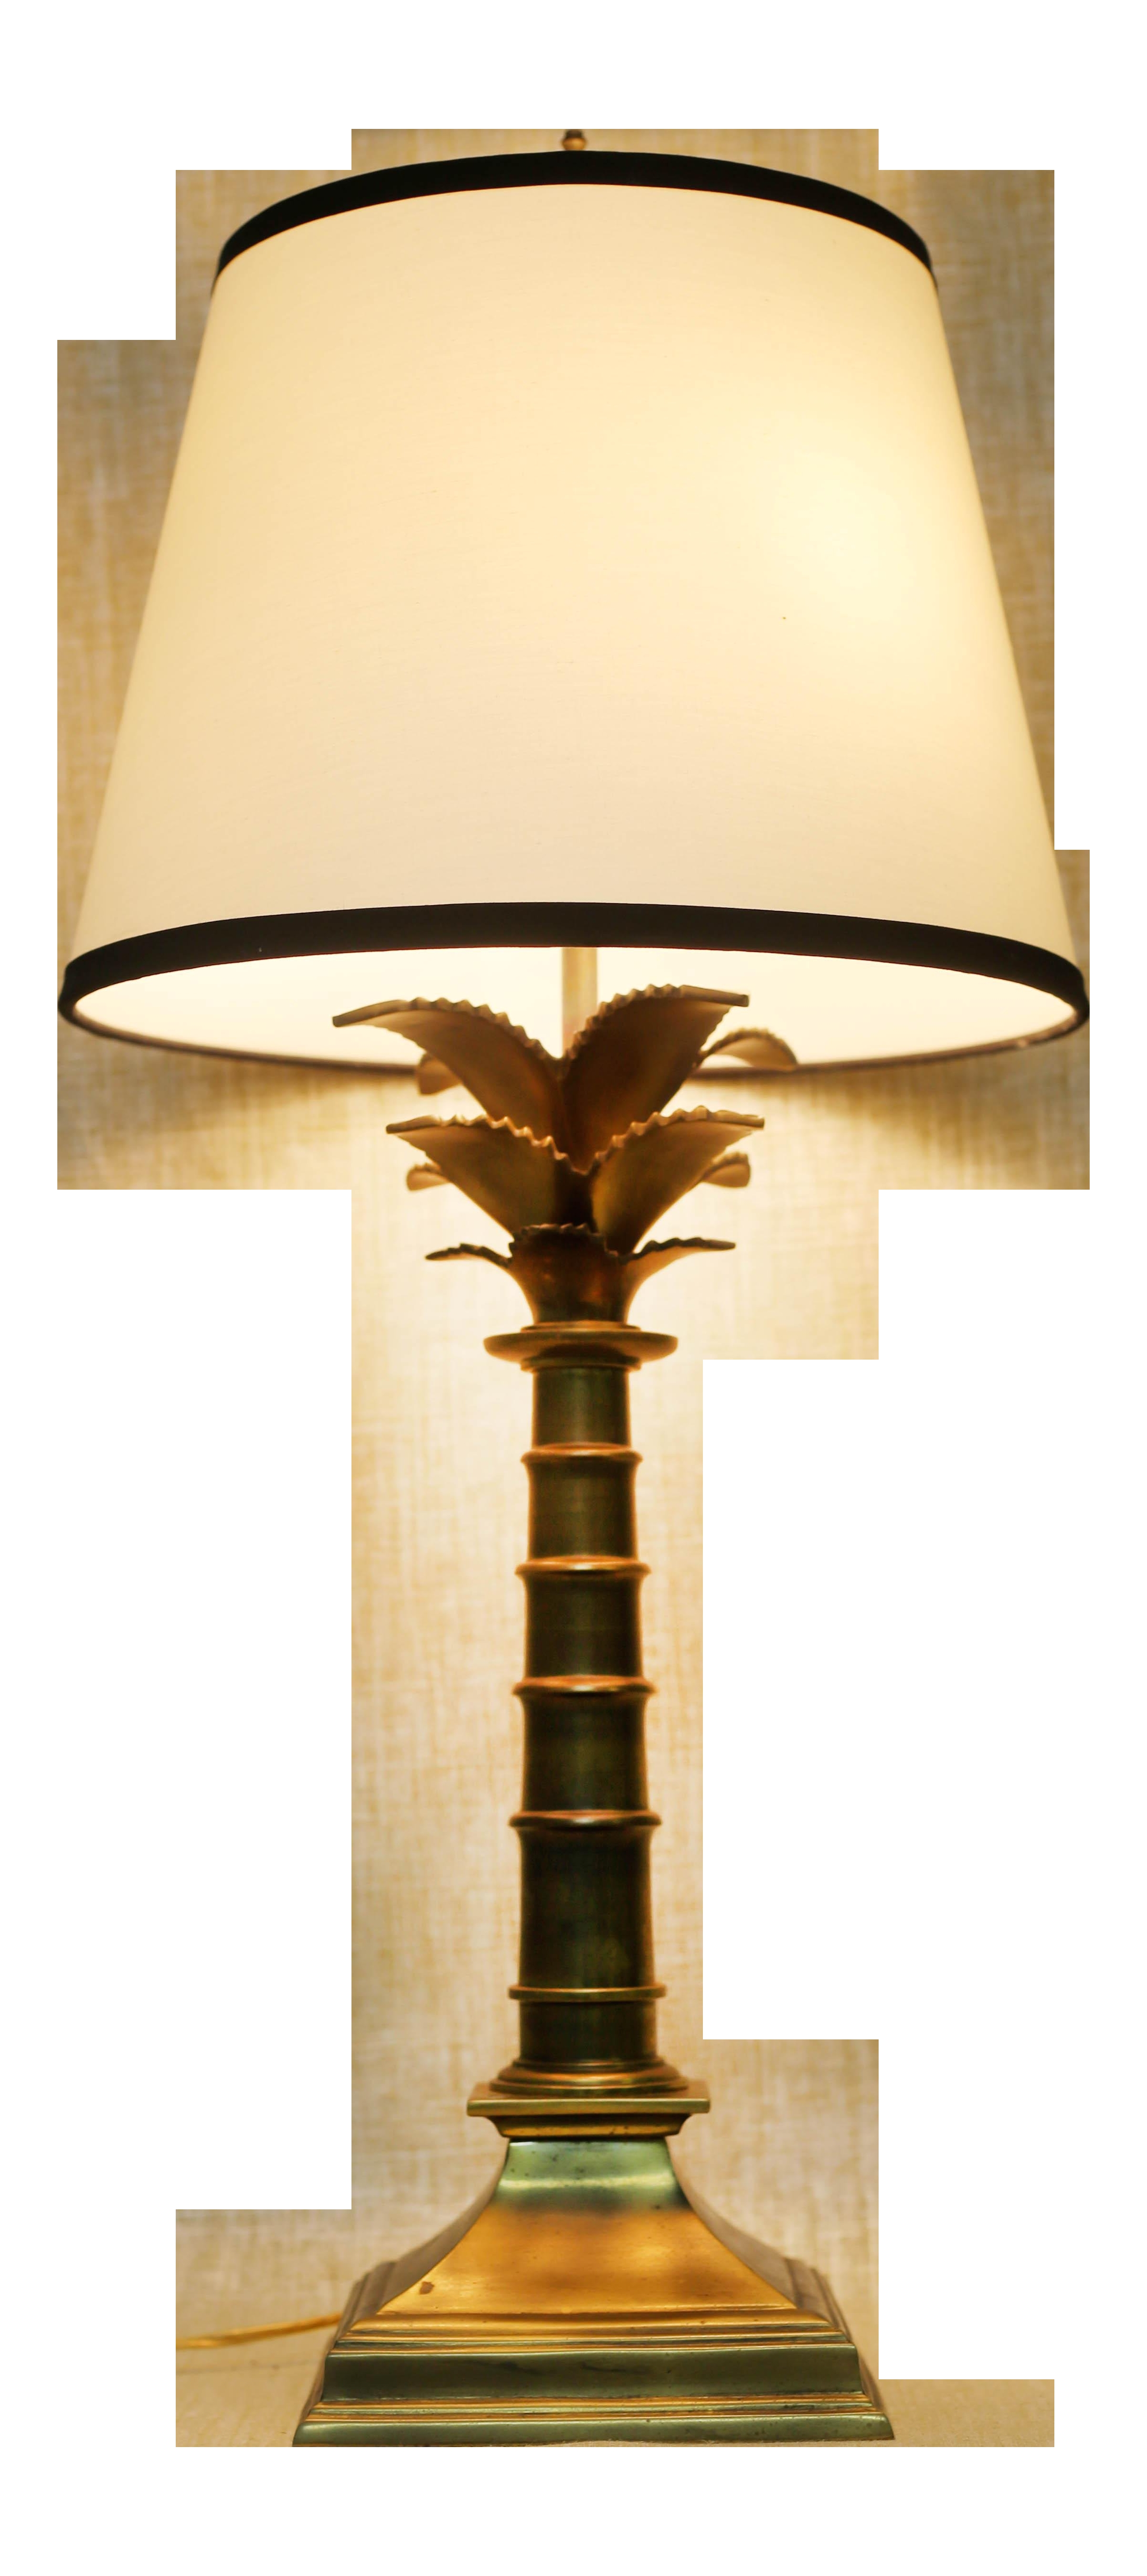 vintage brass palm tree lamp by leviton on chairish com tree lamp brass lamp